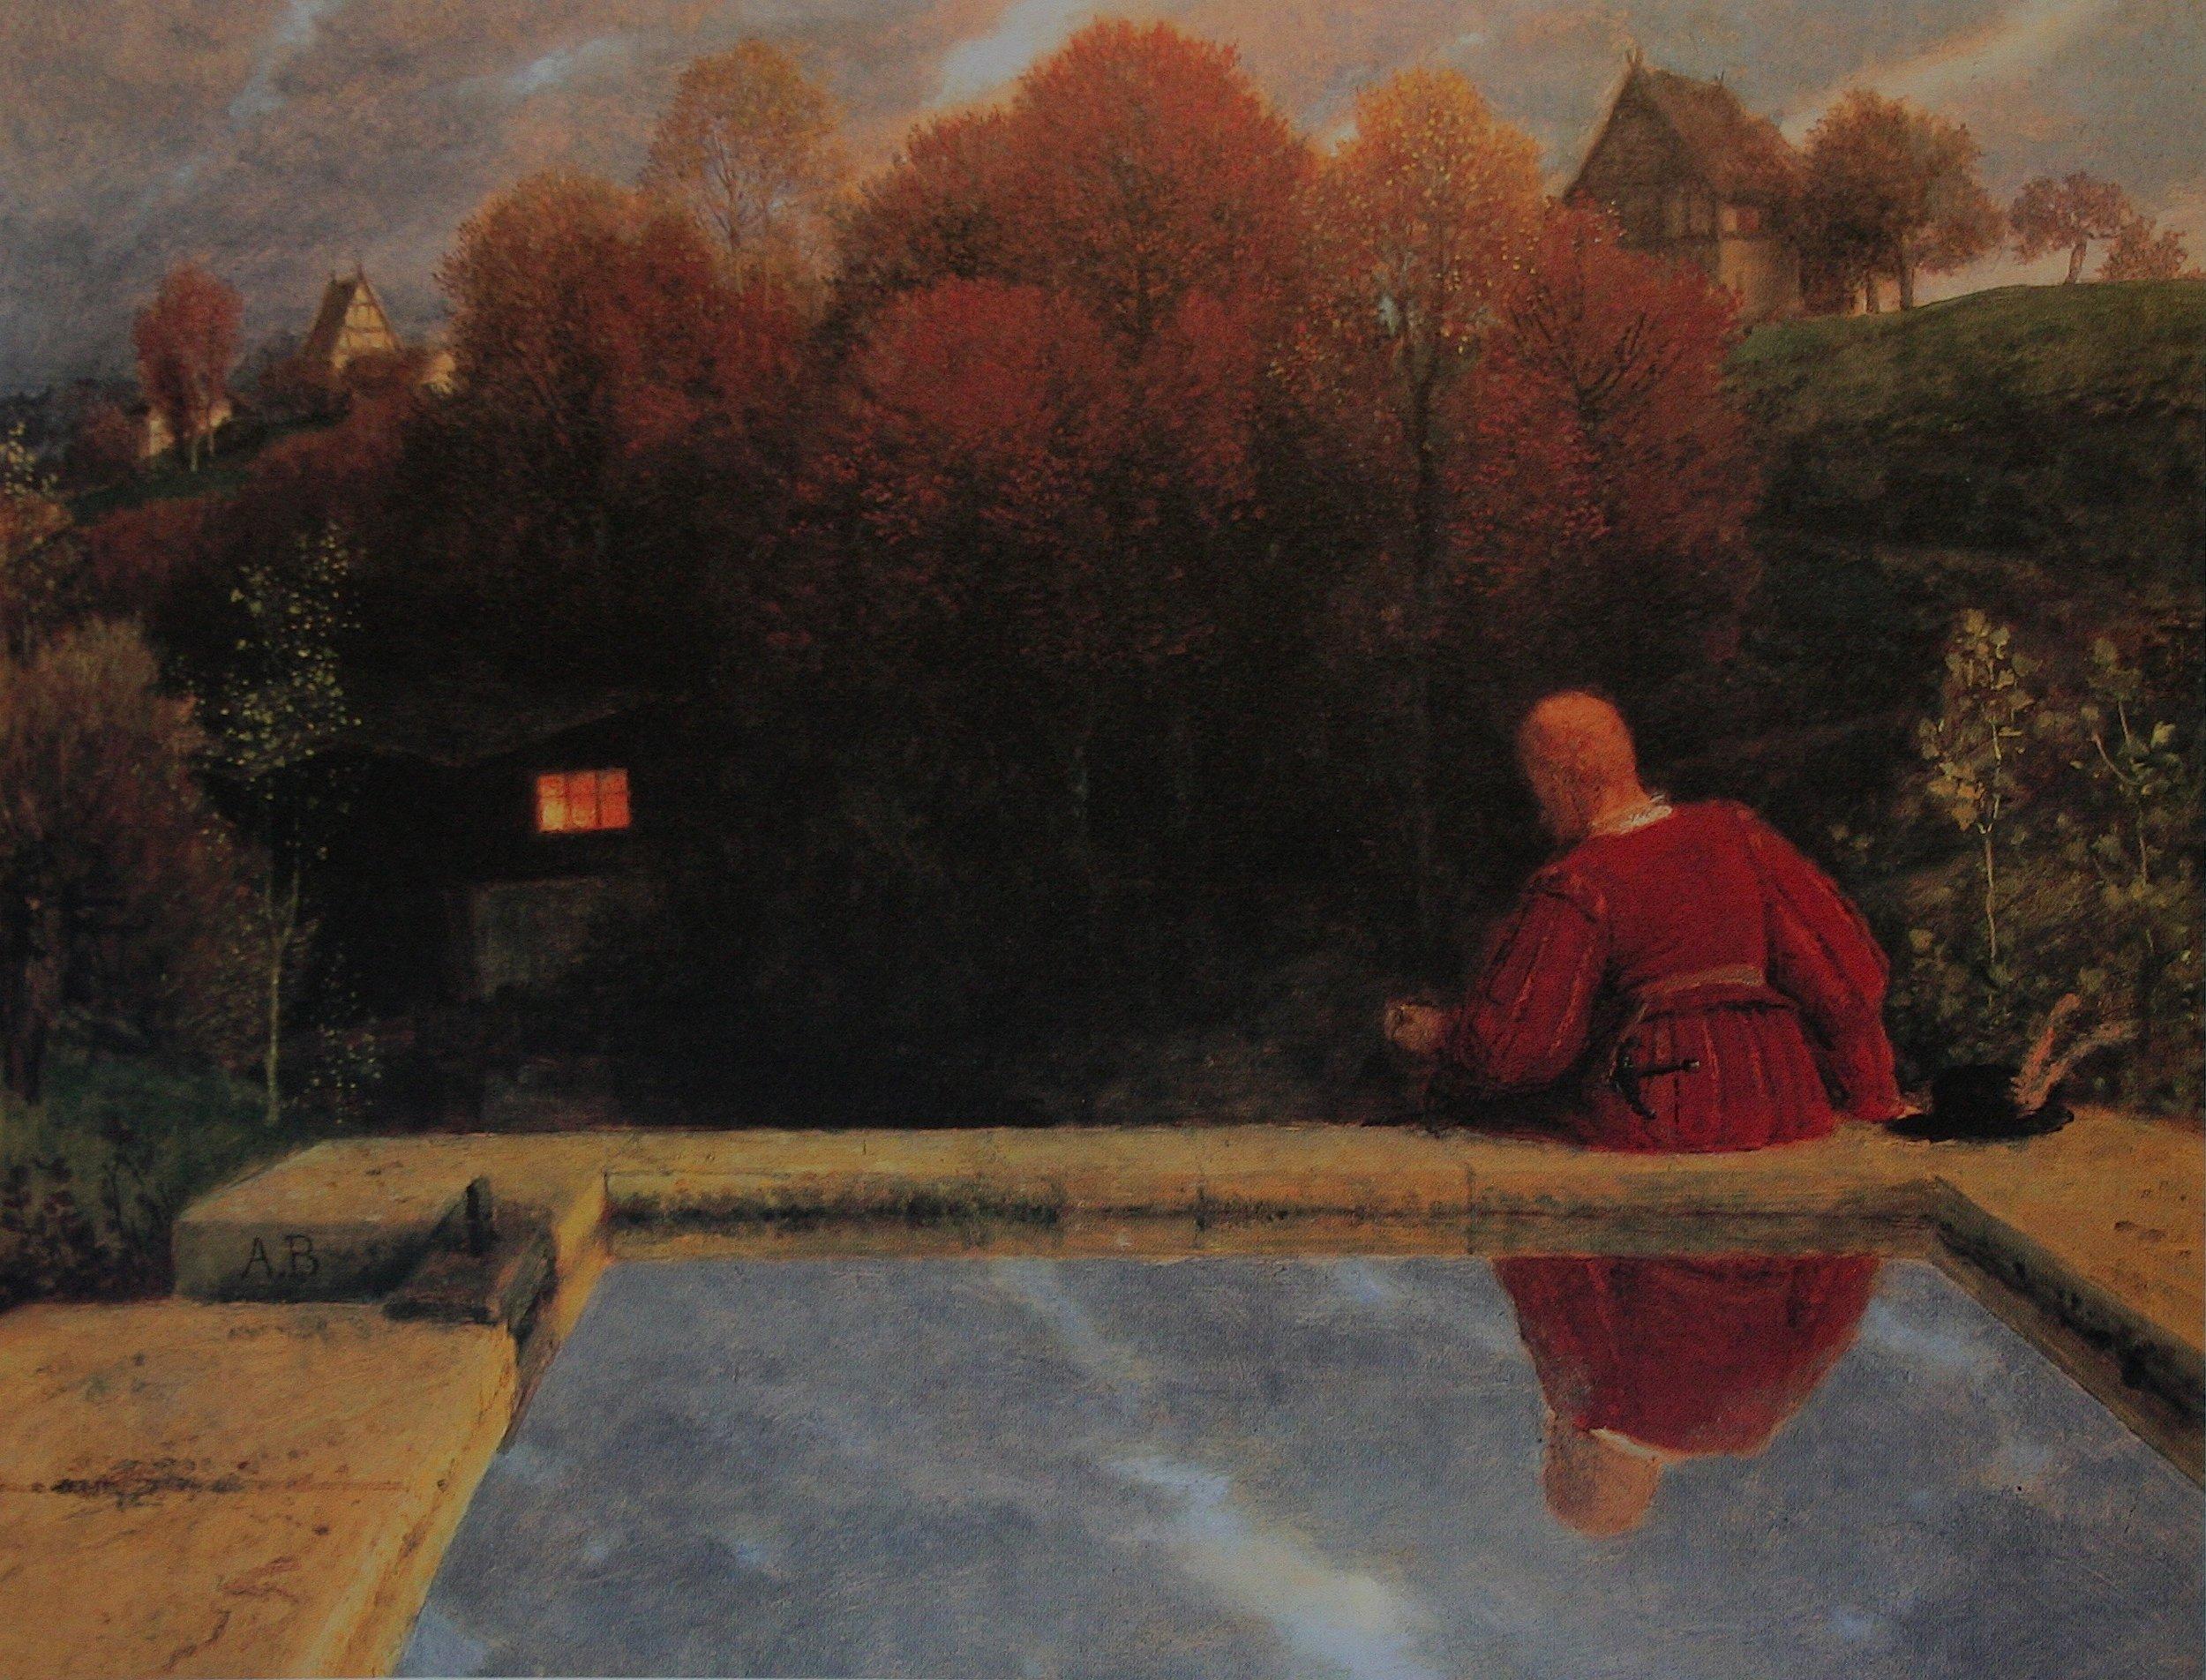 Arnold Böcklin's  The Return , which inspired Rachmaninov's B minor Prélude, Op. 32, No. 10.